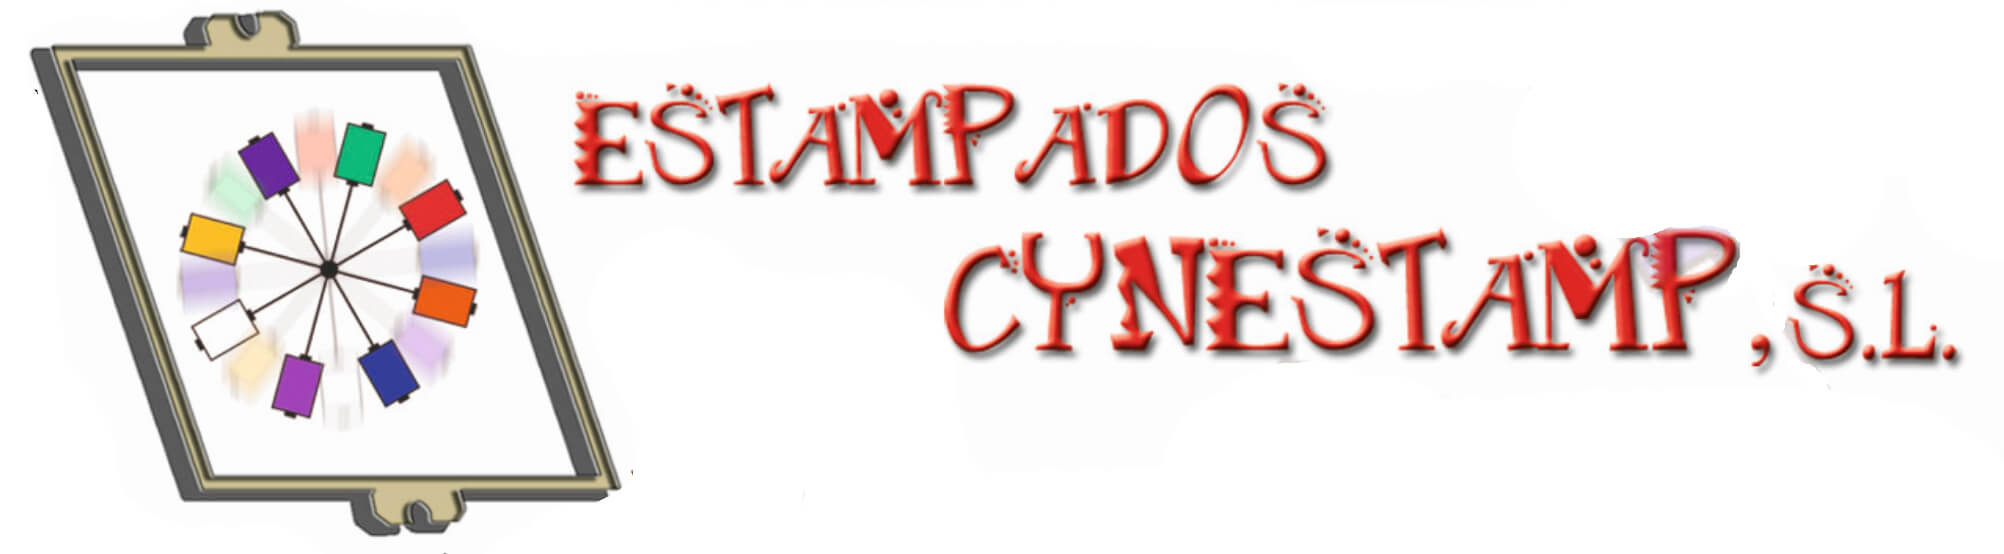 Cynestamp